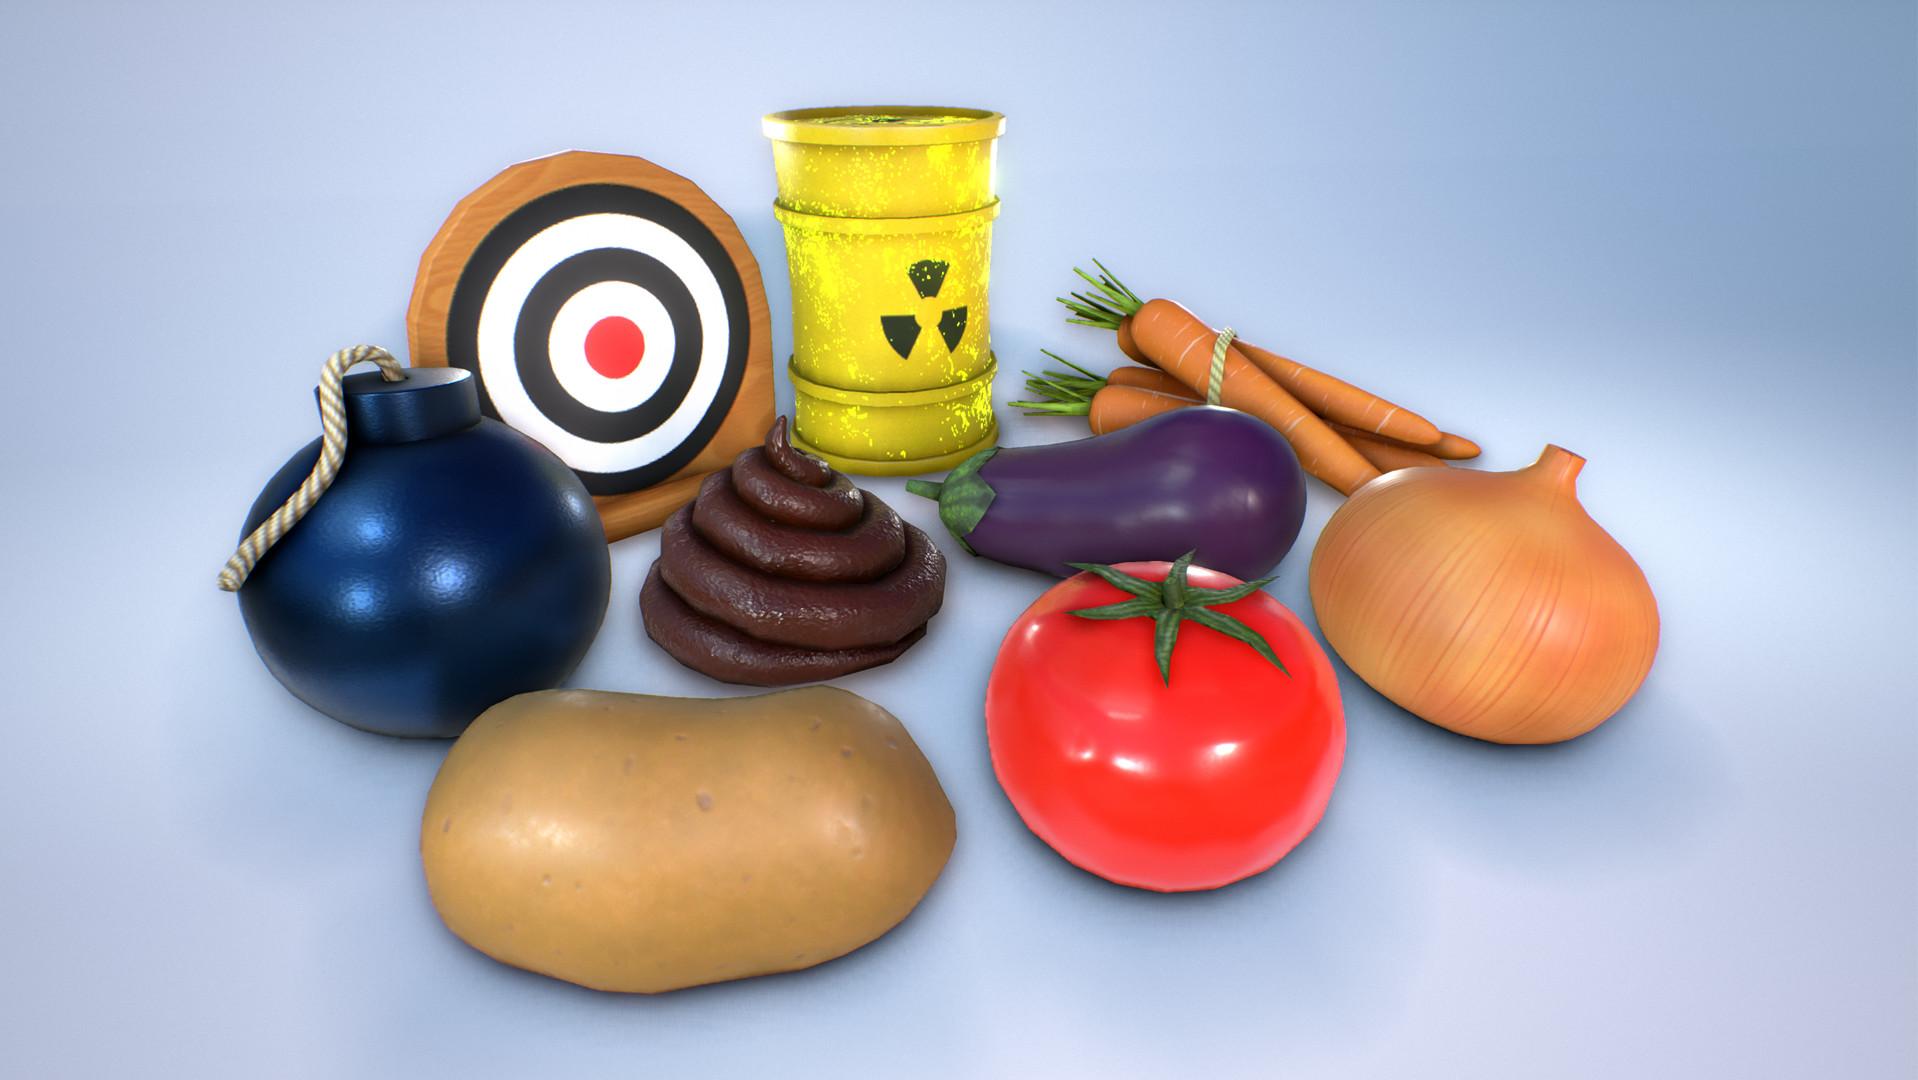 Johannes terhen sundlov ingredients as